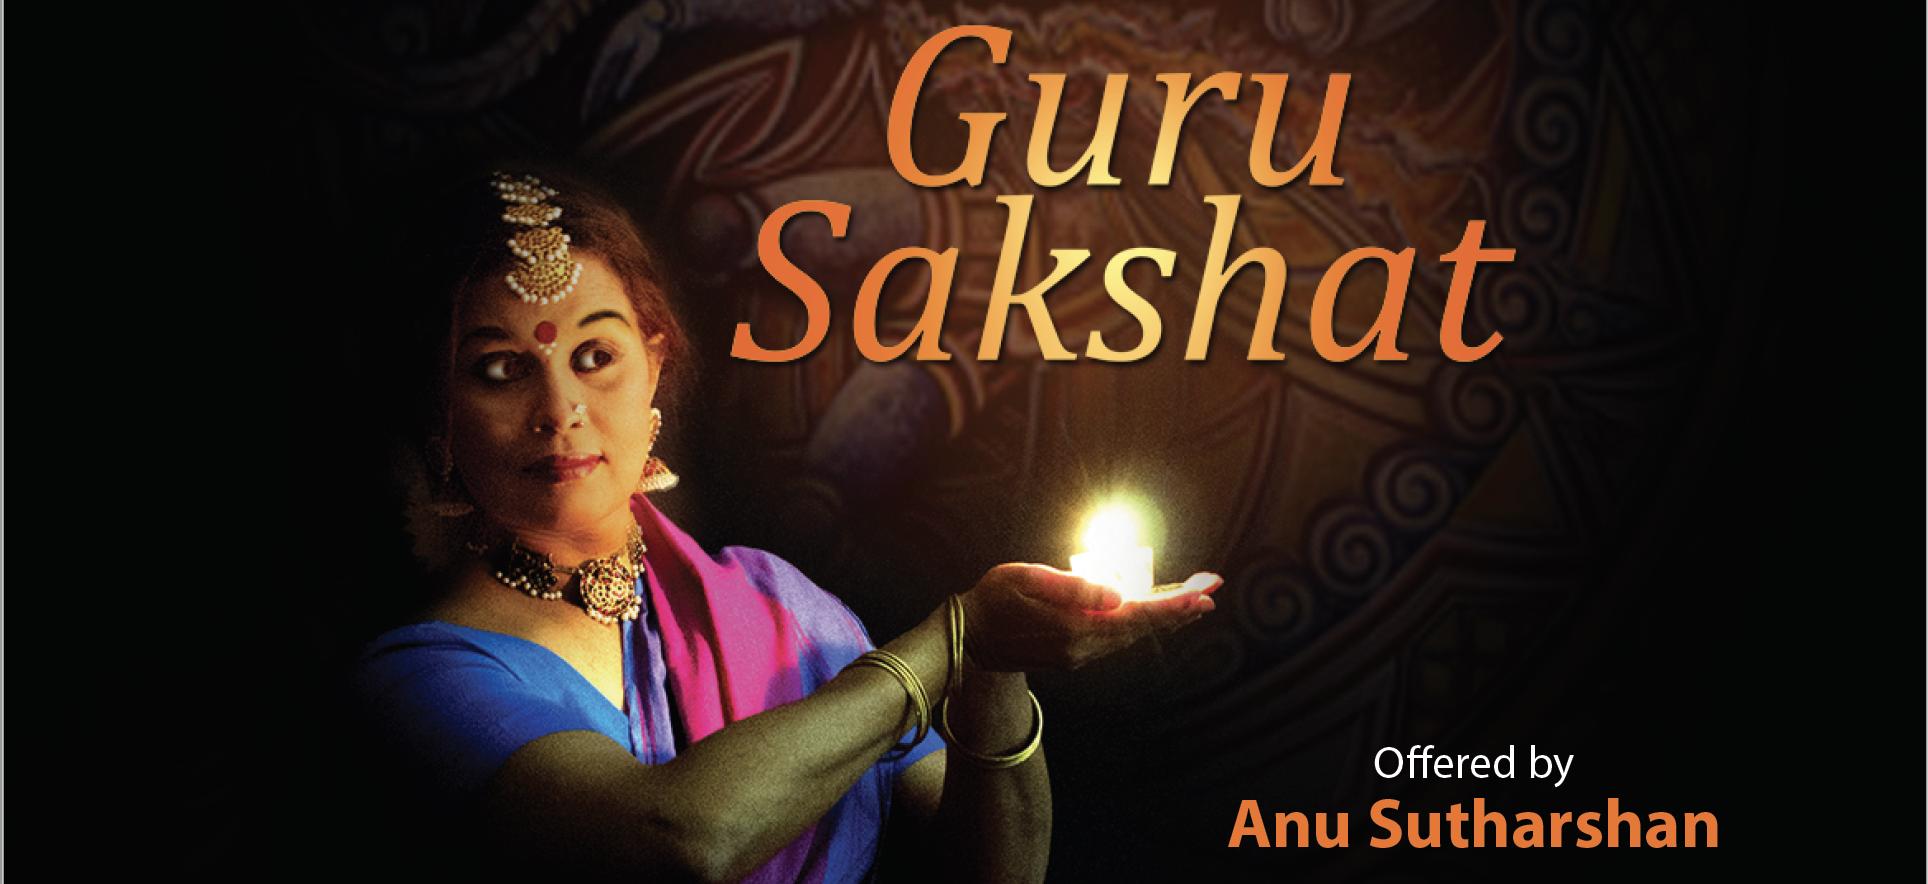 Guru Sakshat